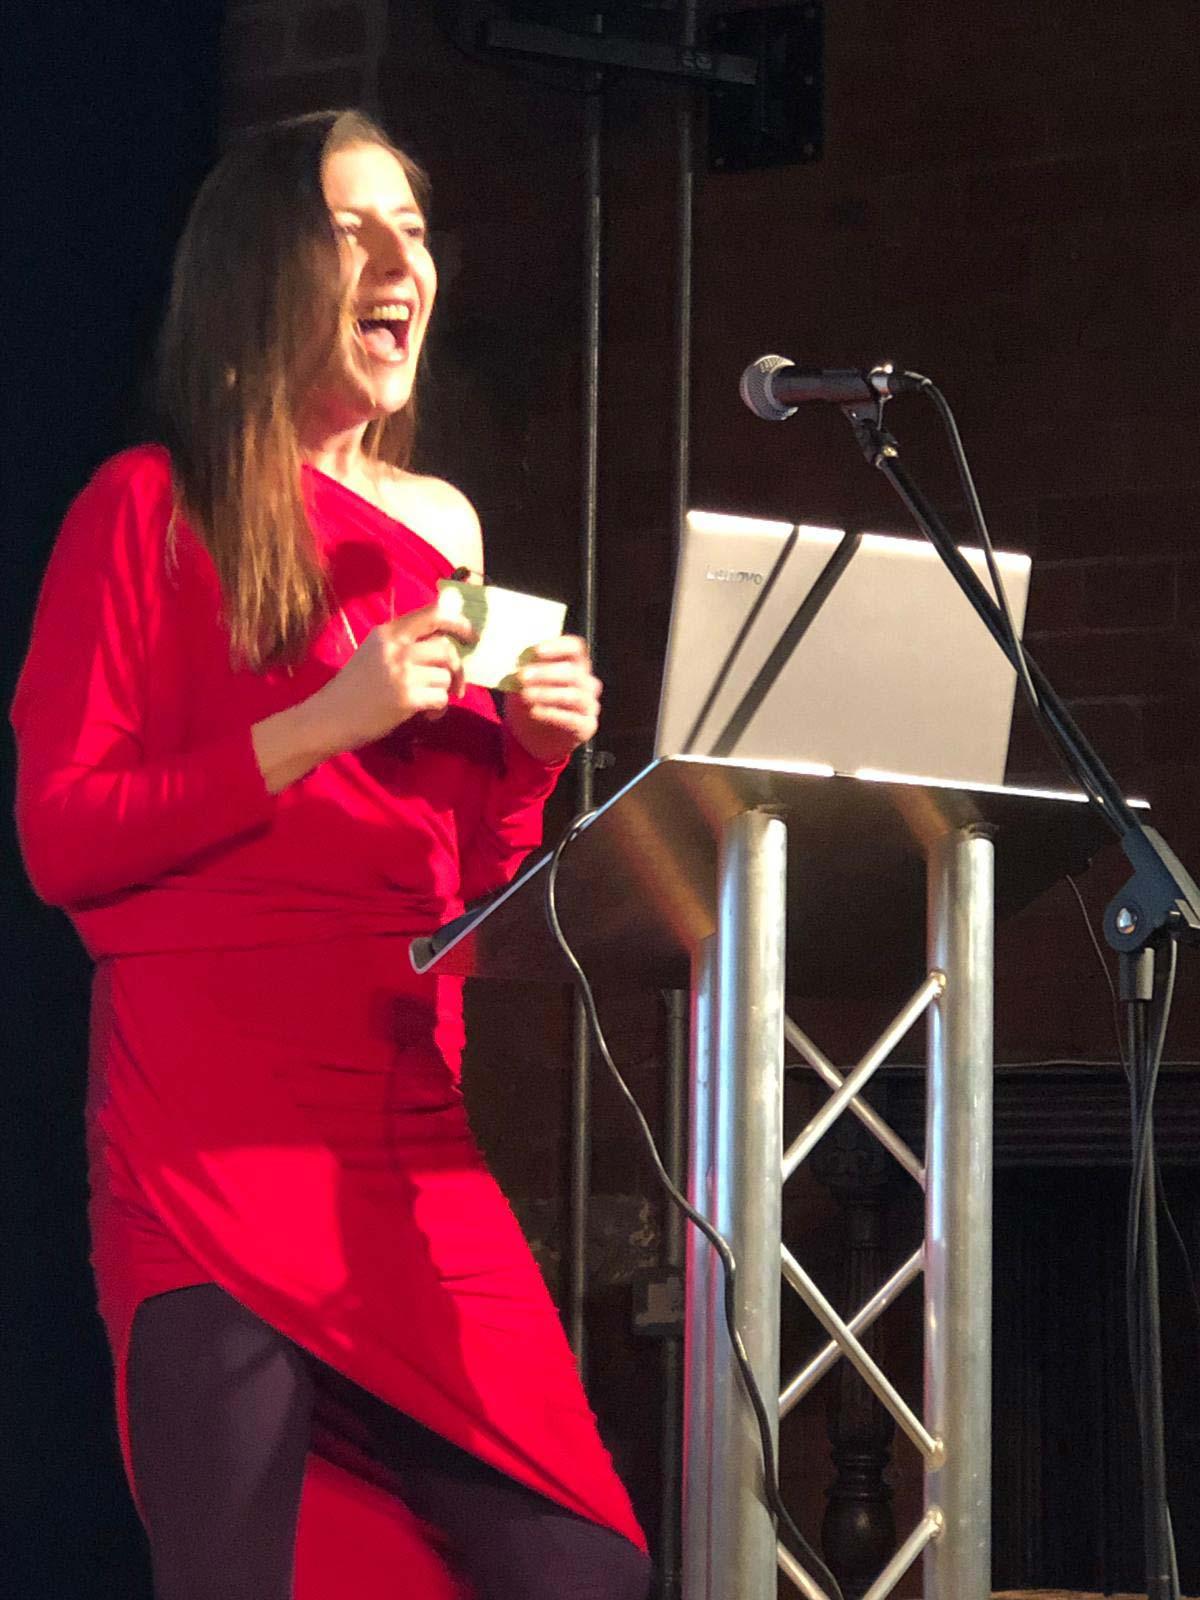 Sexologist, Sarah Rose Bright speaking in red dress